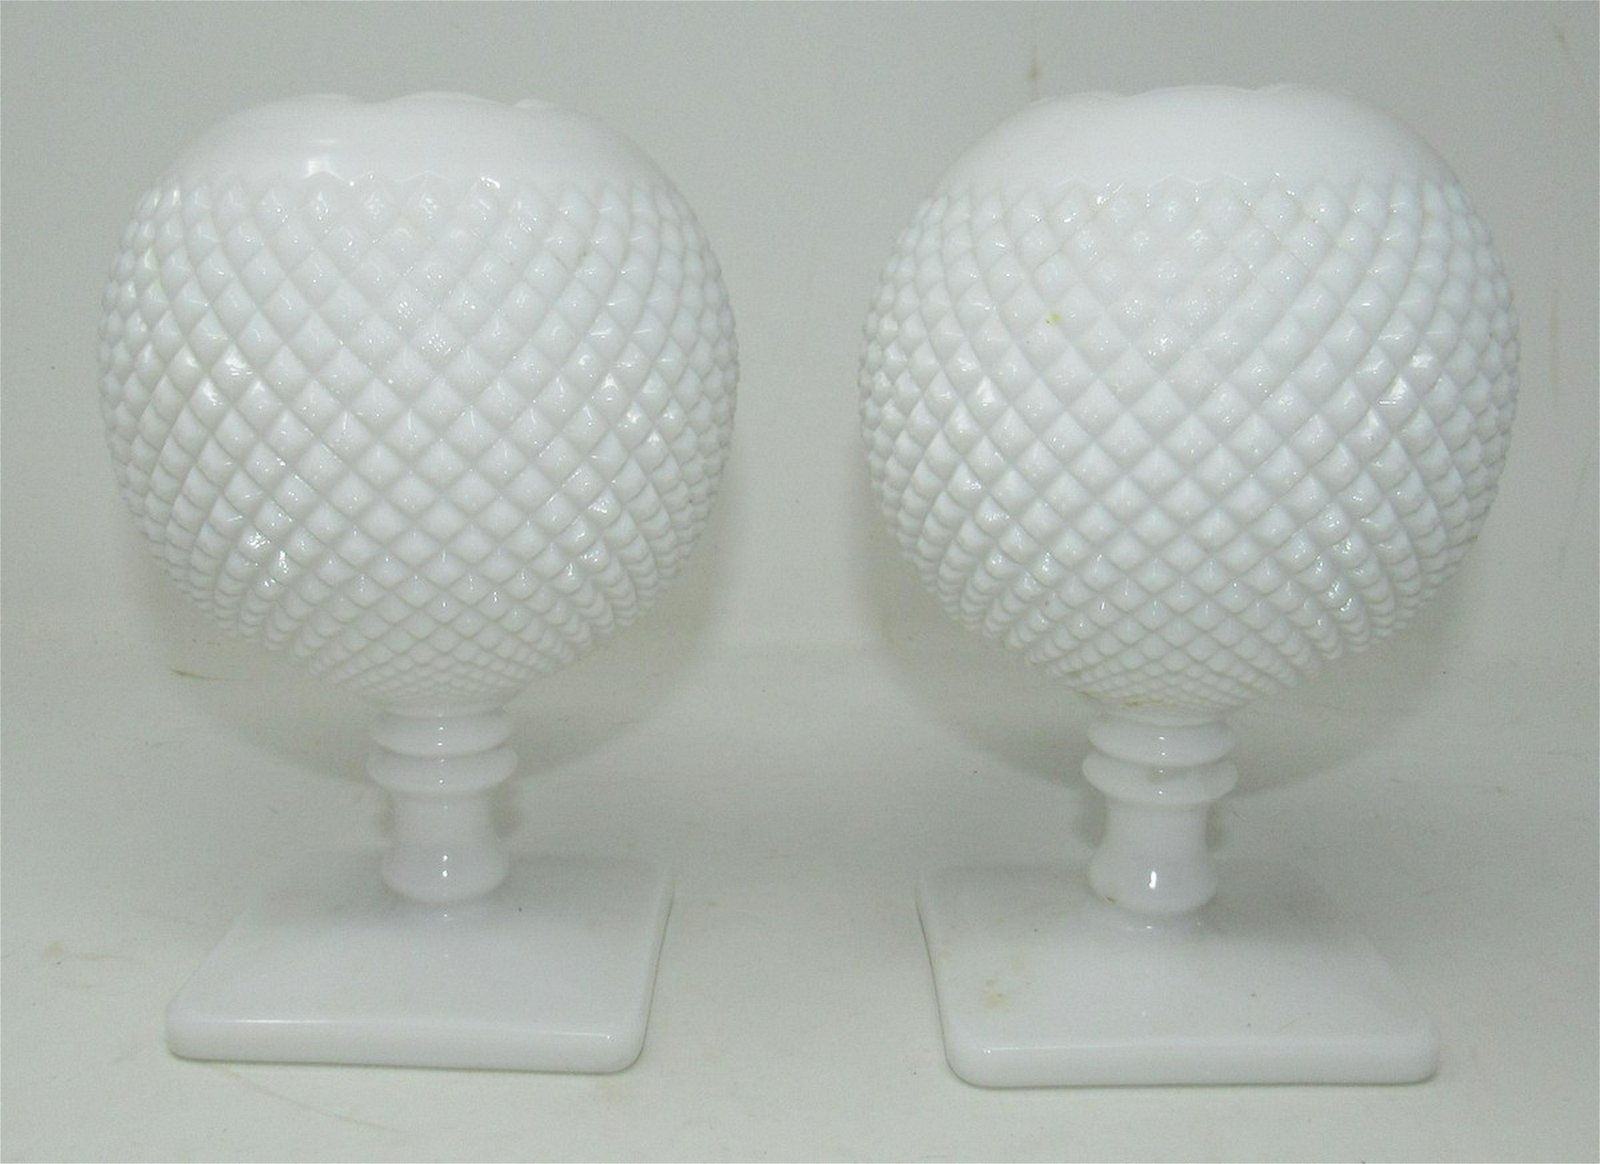 Pair of Milk Glass Vases